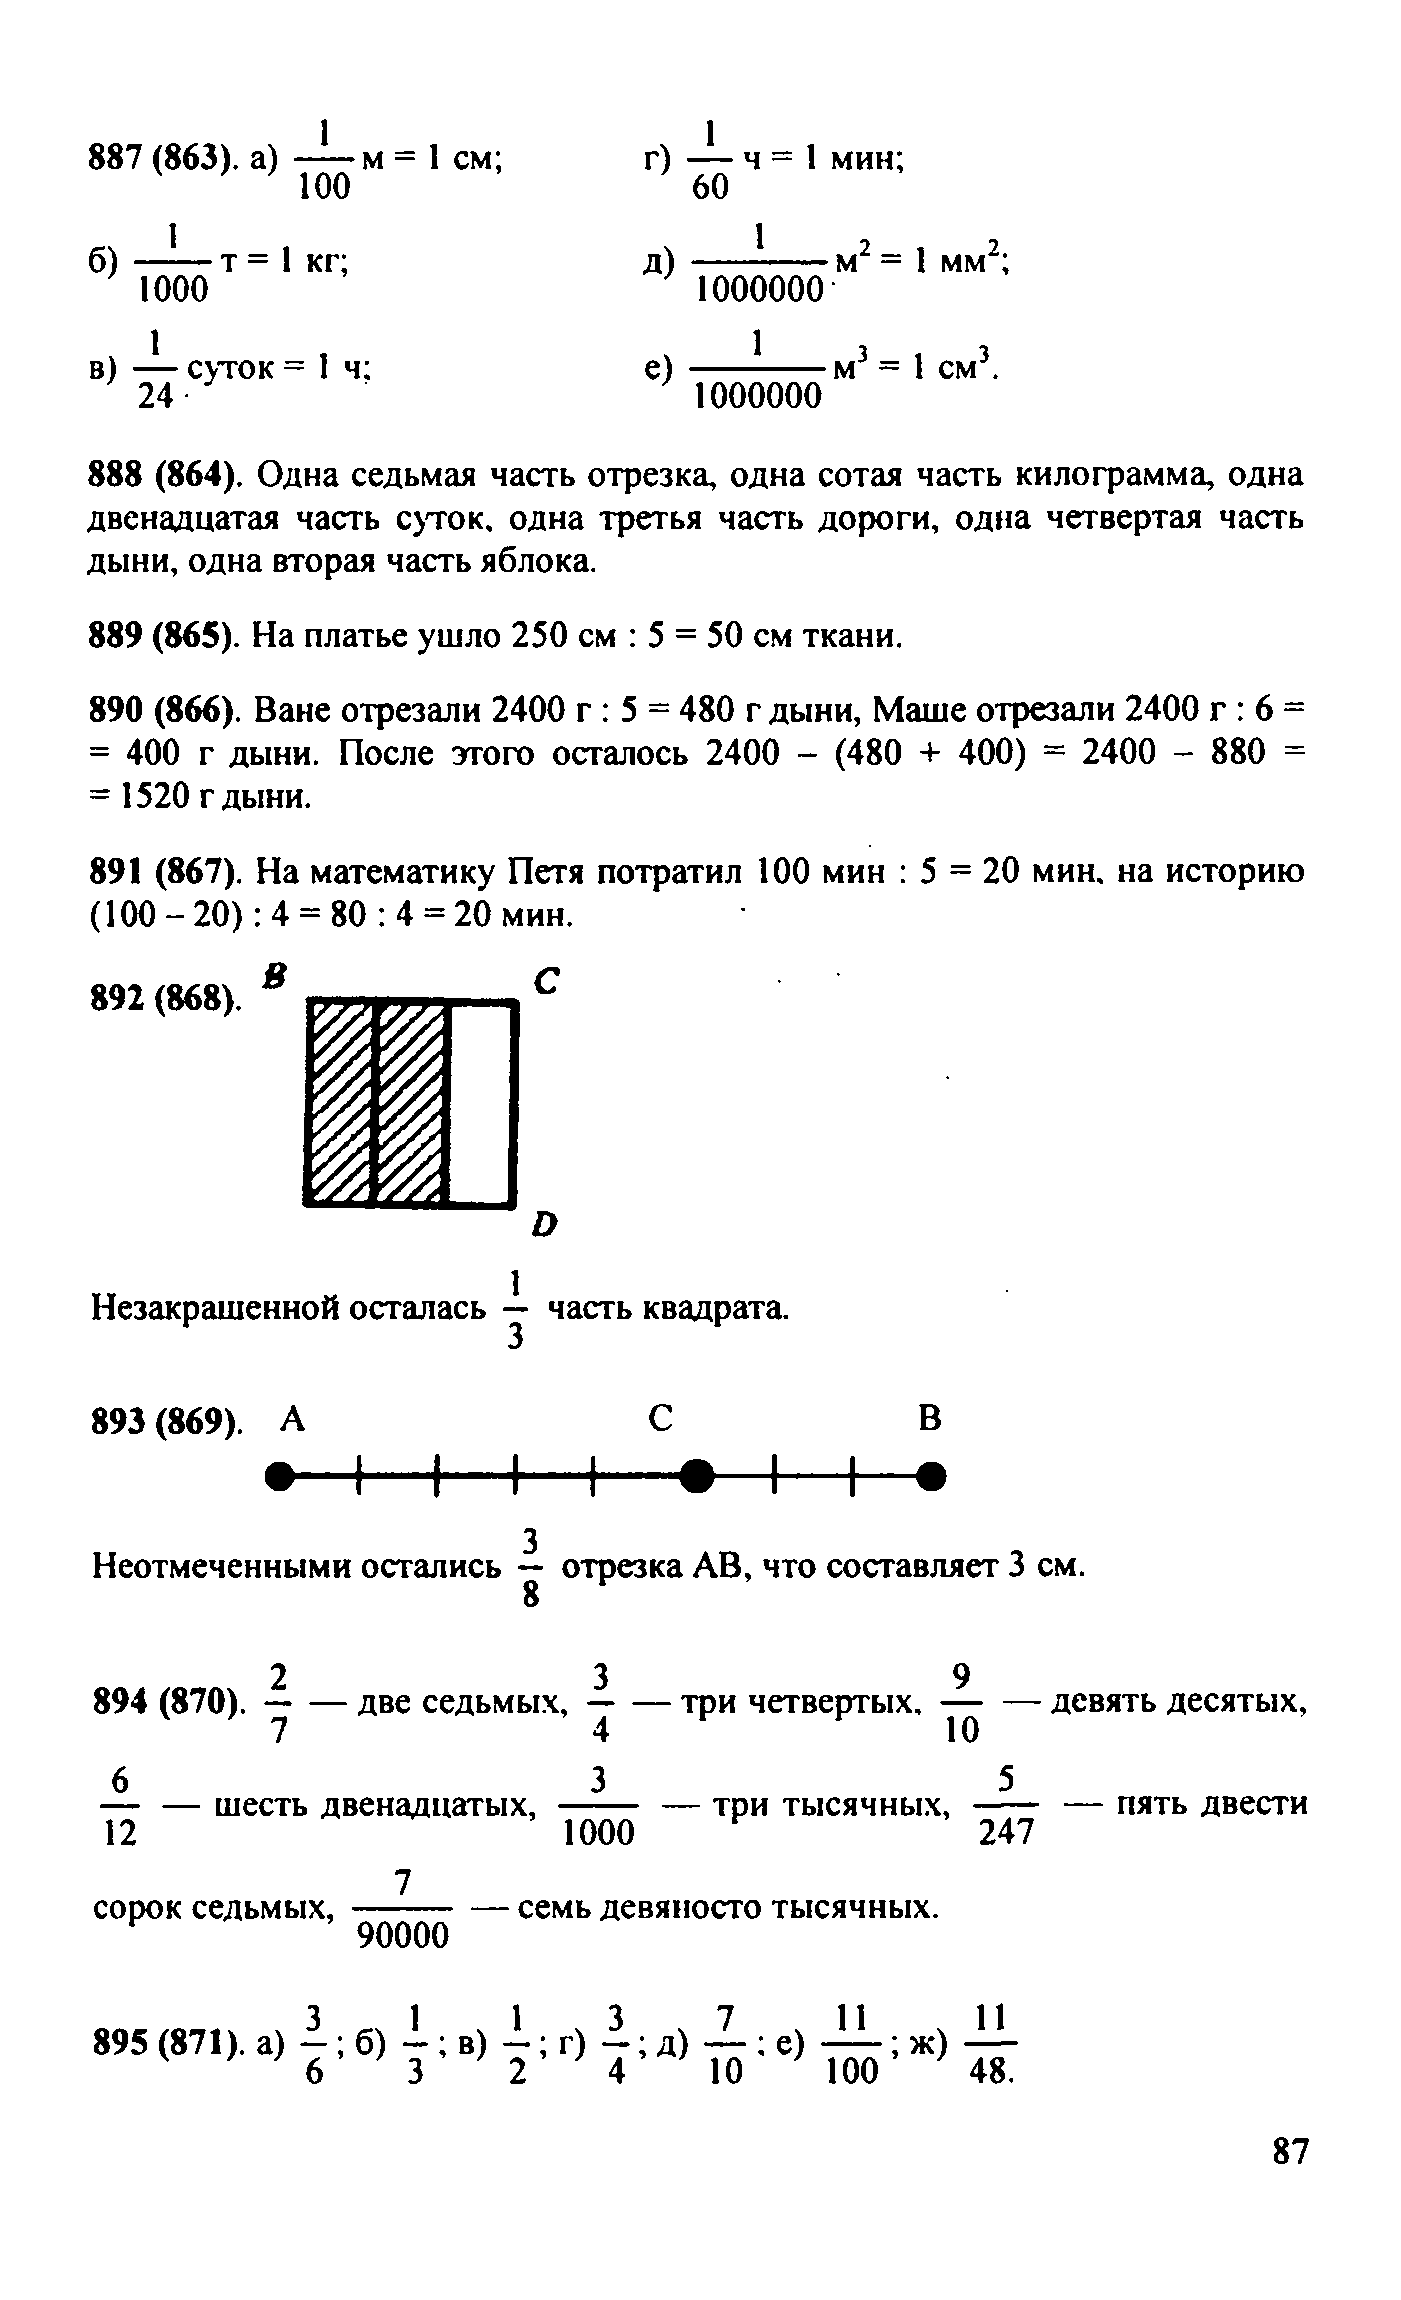 Гдз по математике 5 класс виленкин 2005